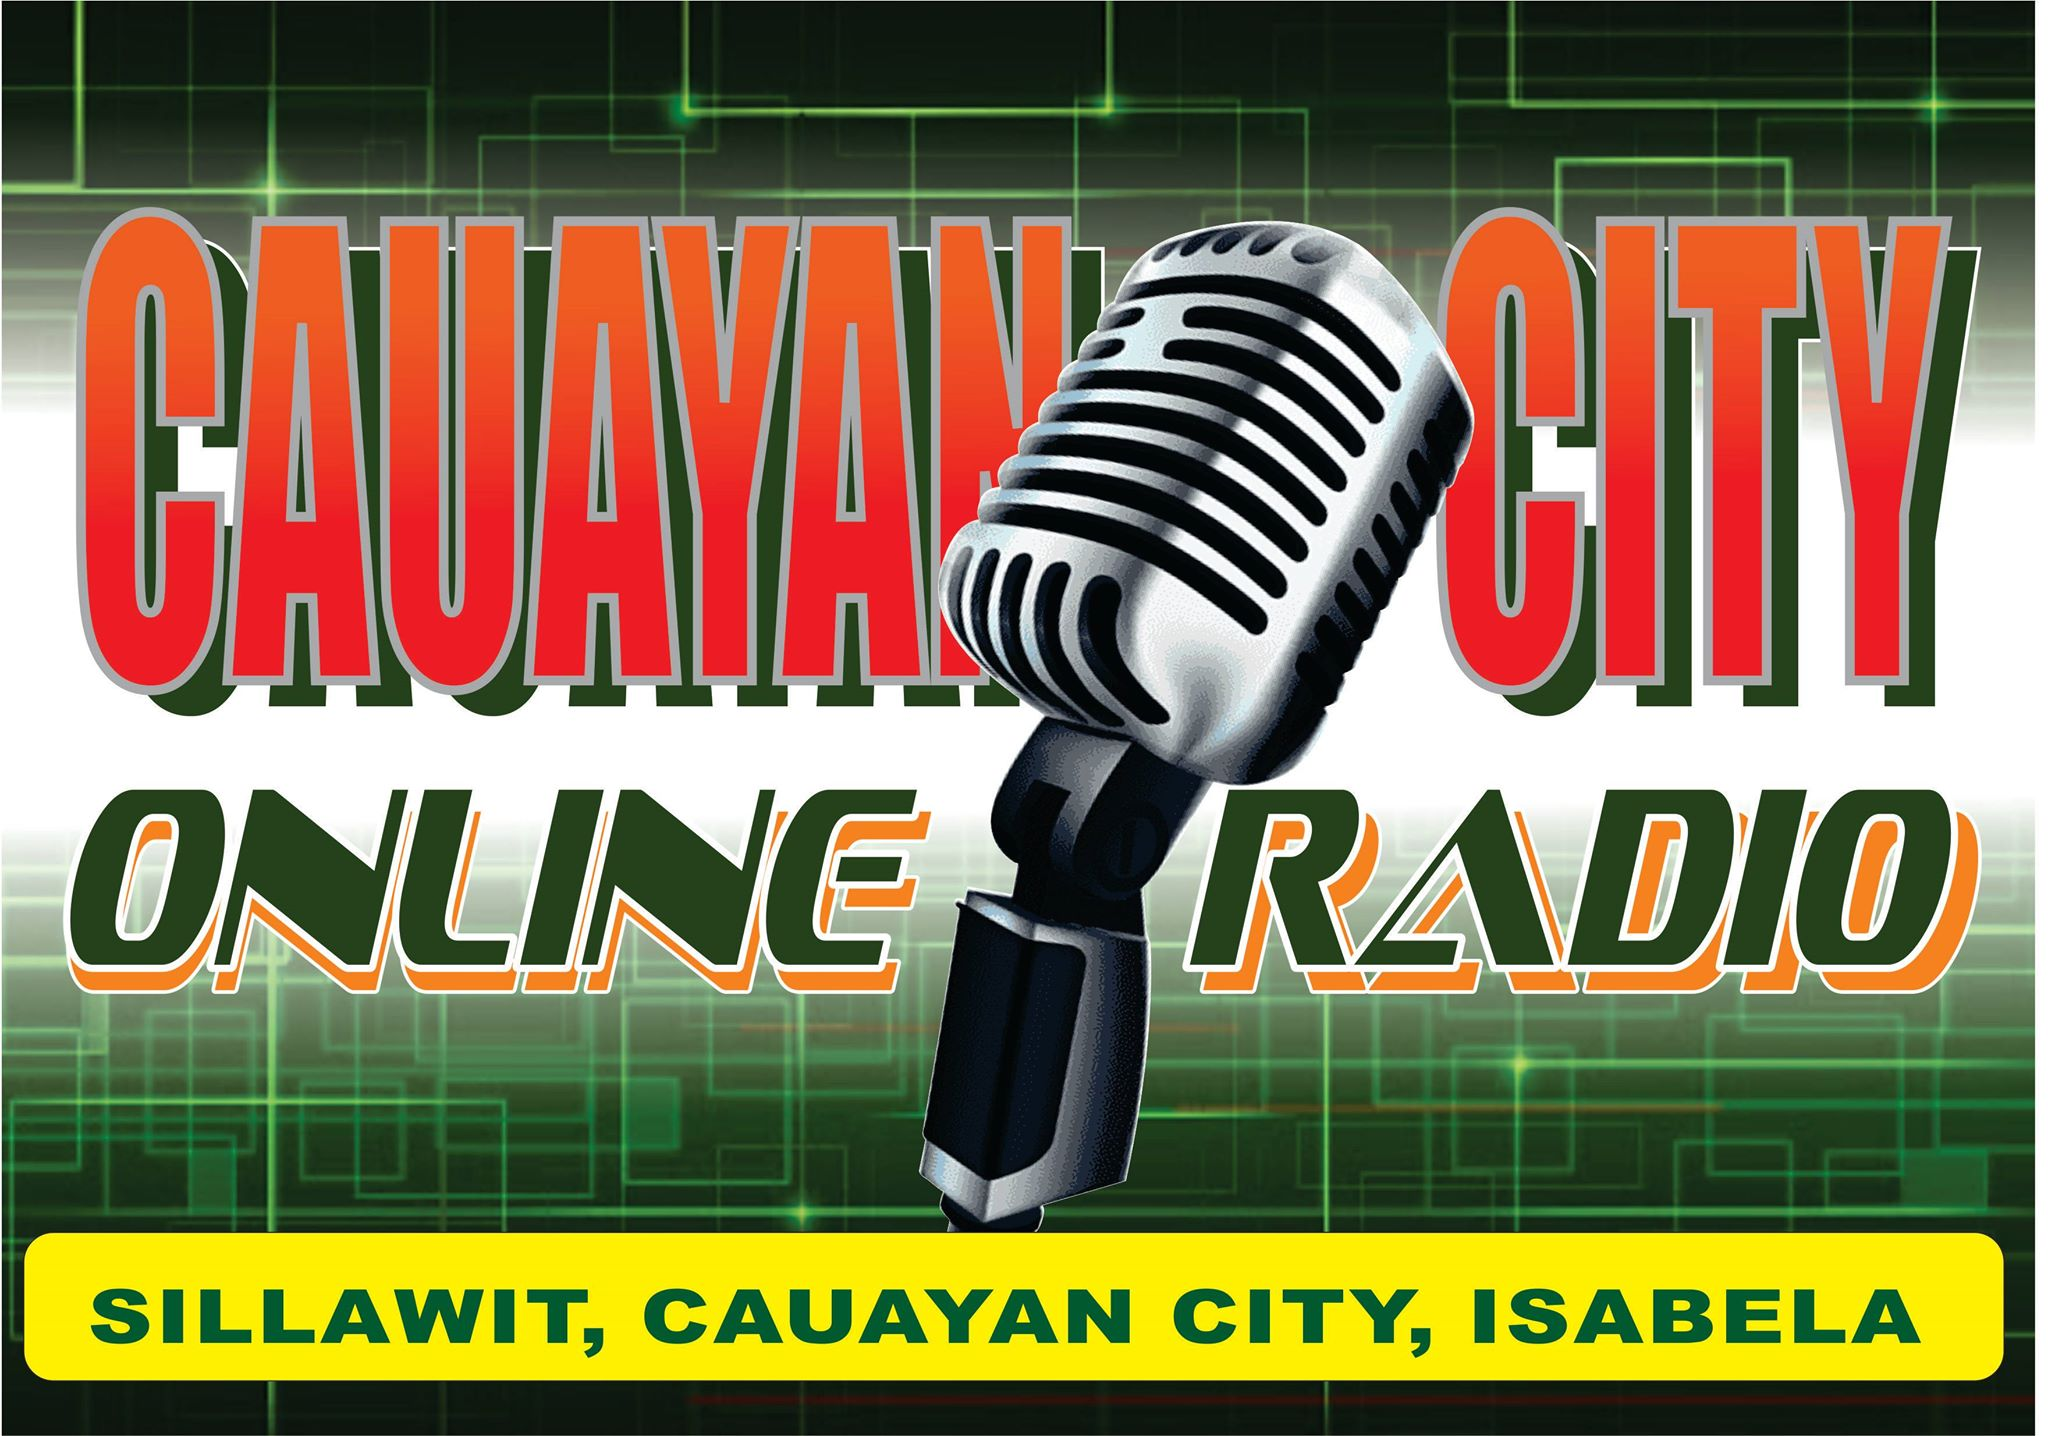 Cauayan City Online Radio Philippines